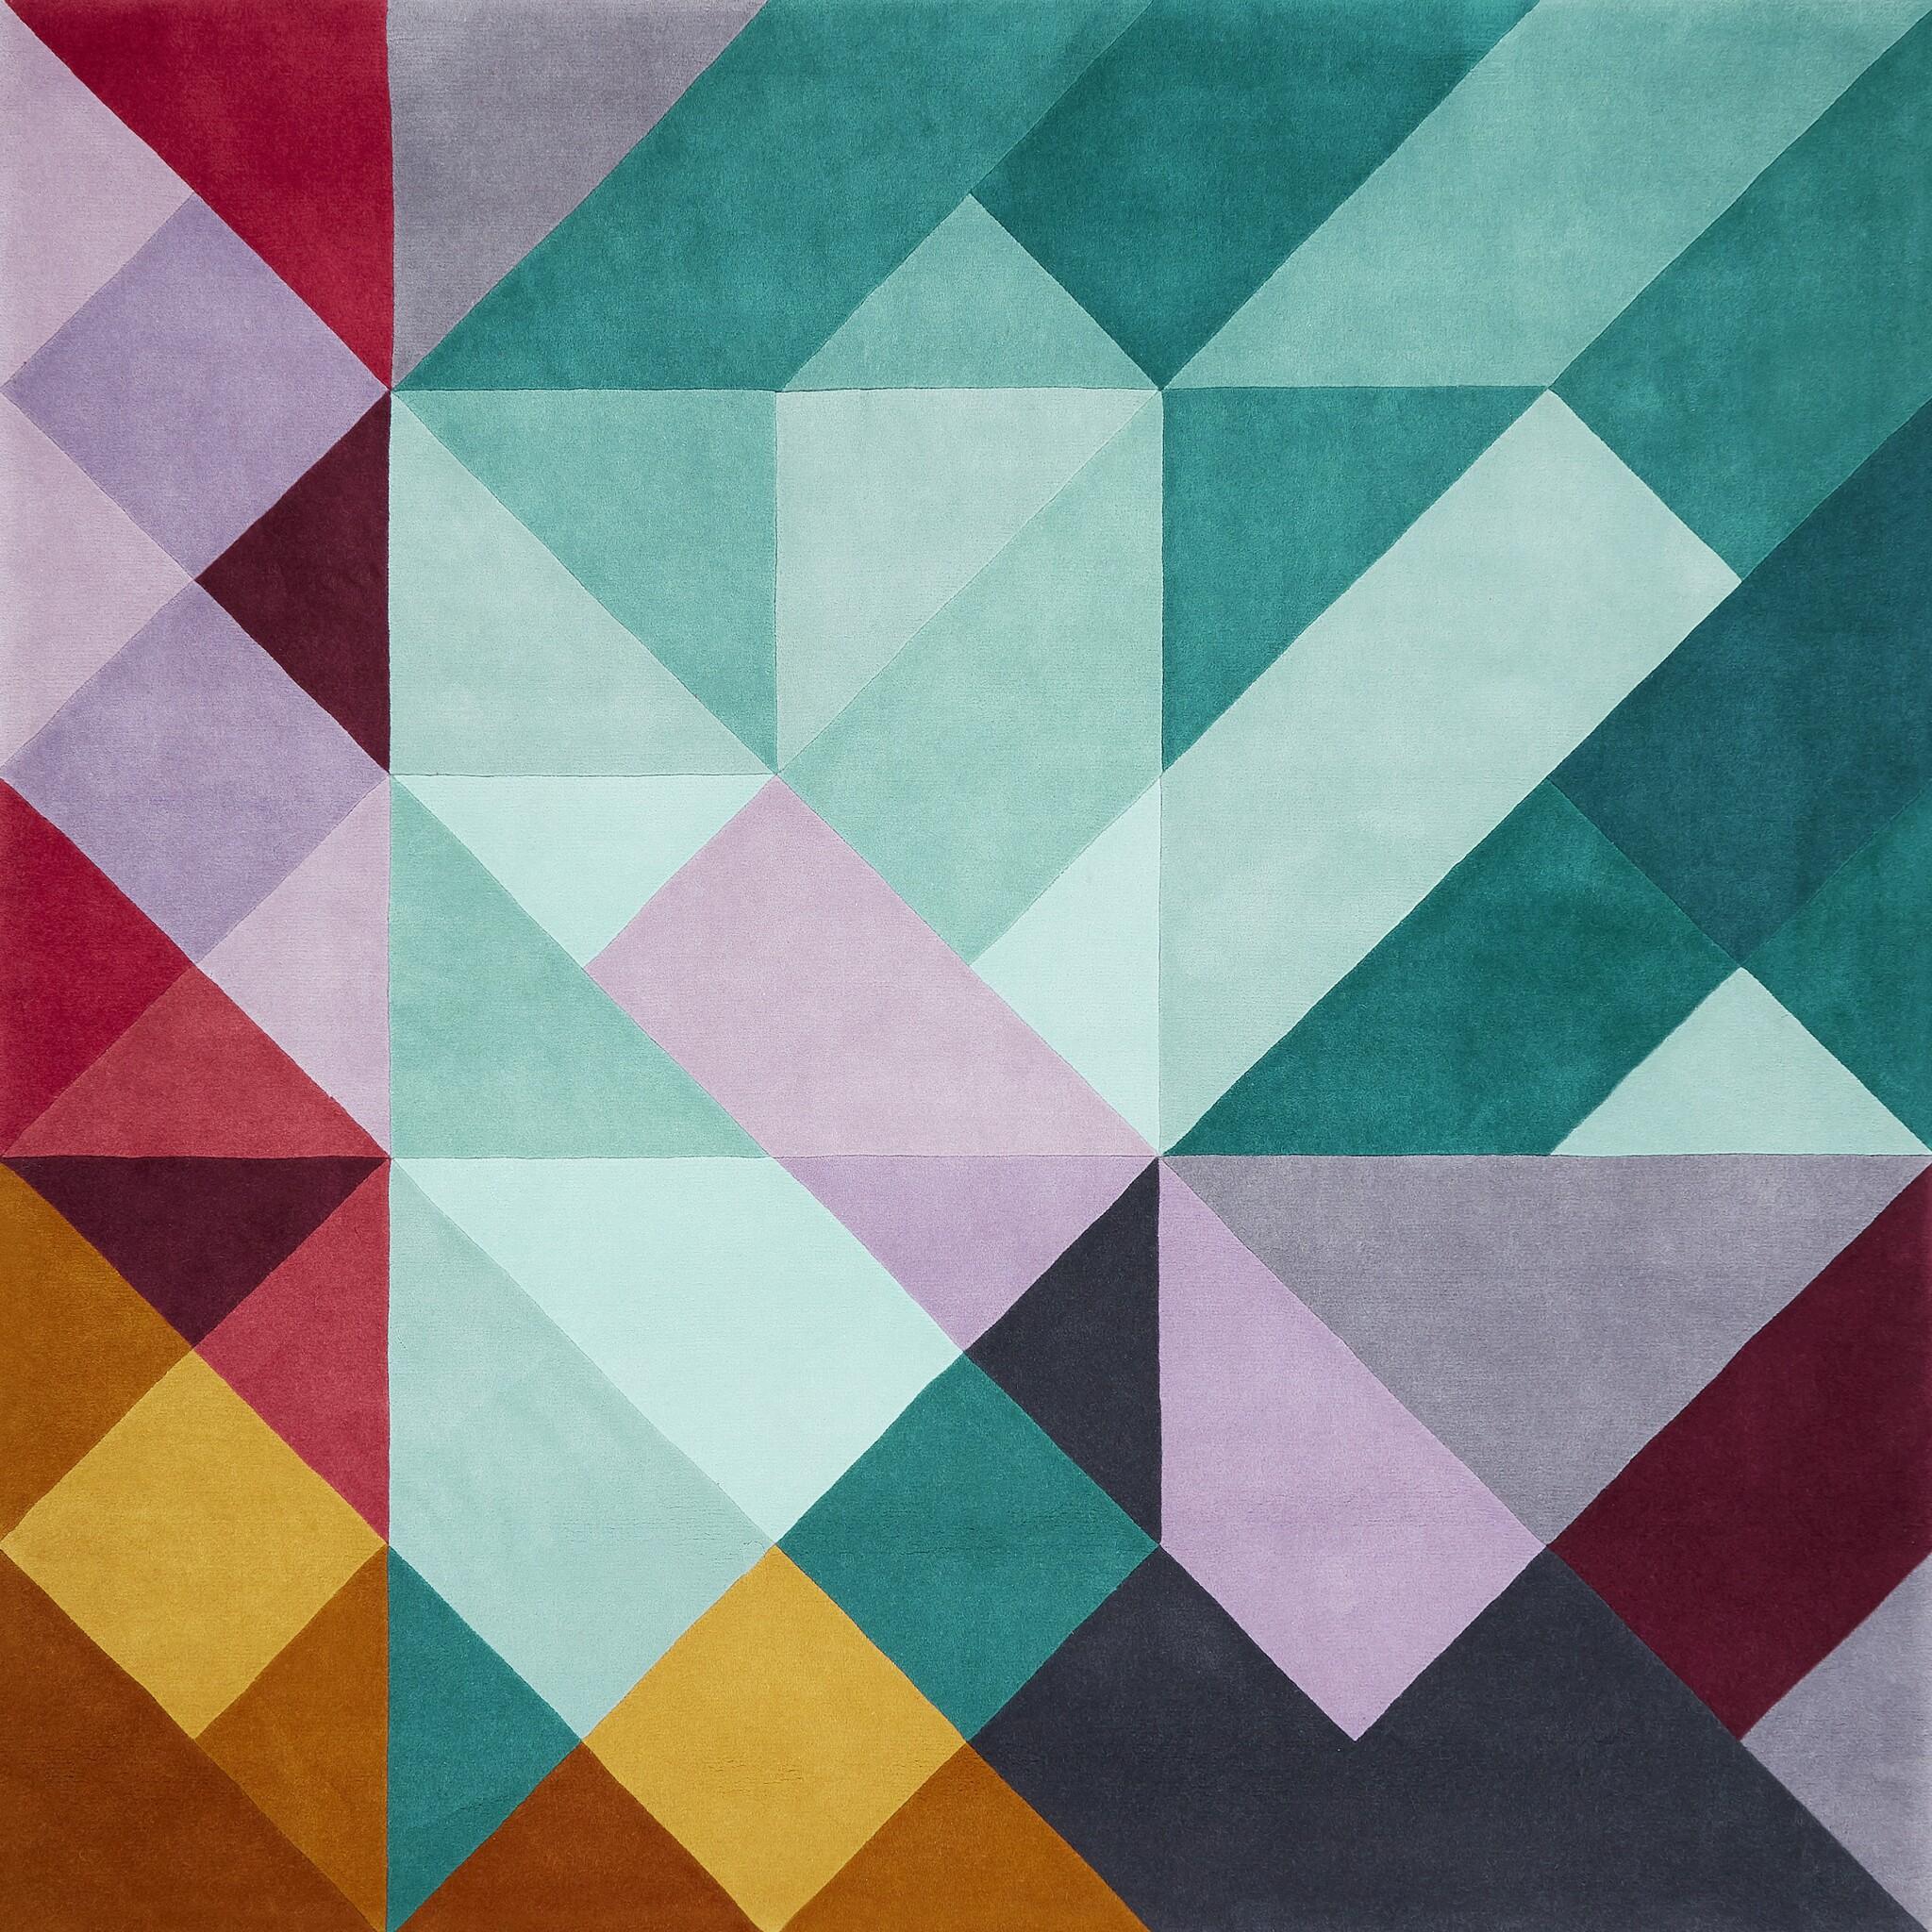 LIBERTY_By Loomah Bespoke Carpets & Rugs